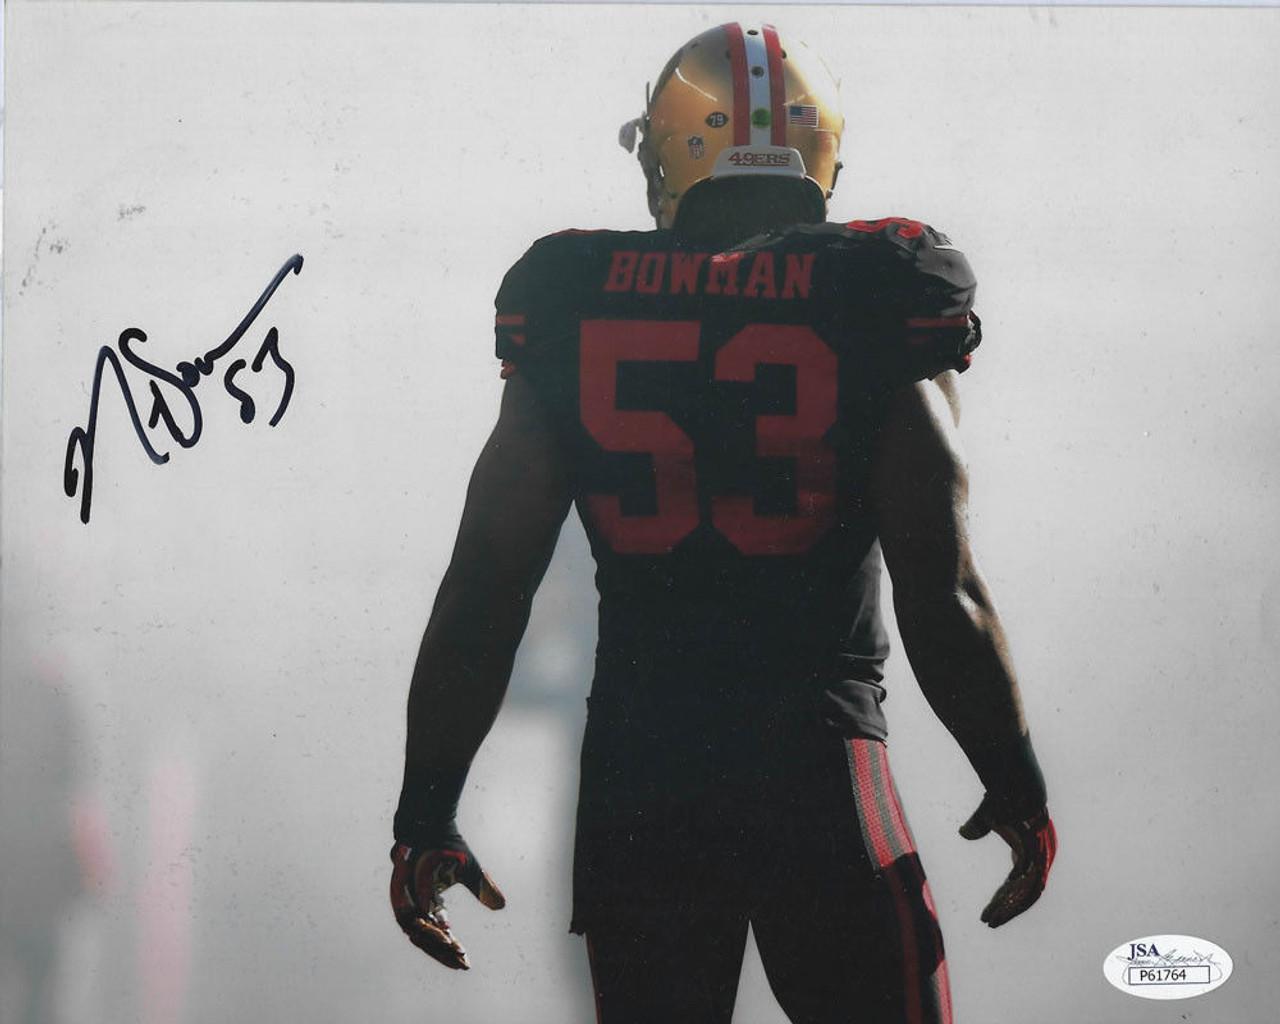 cf5f4b47 NaVarro Bowman San Francisco 49ers Autographed 8 x 10 Photo